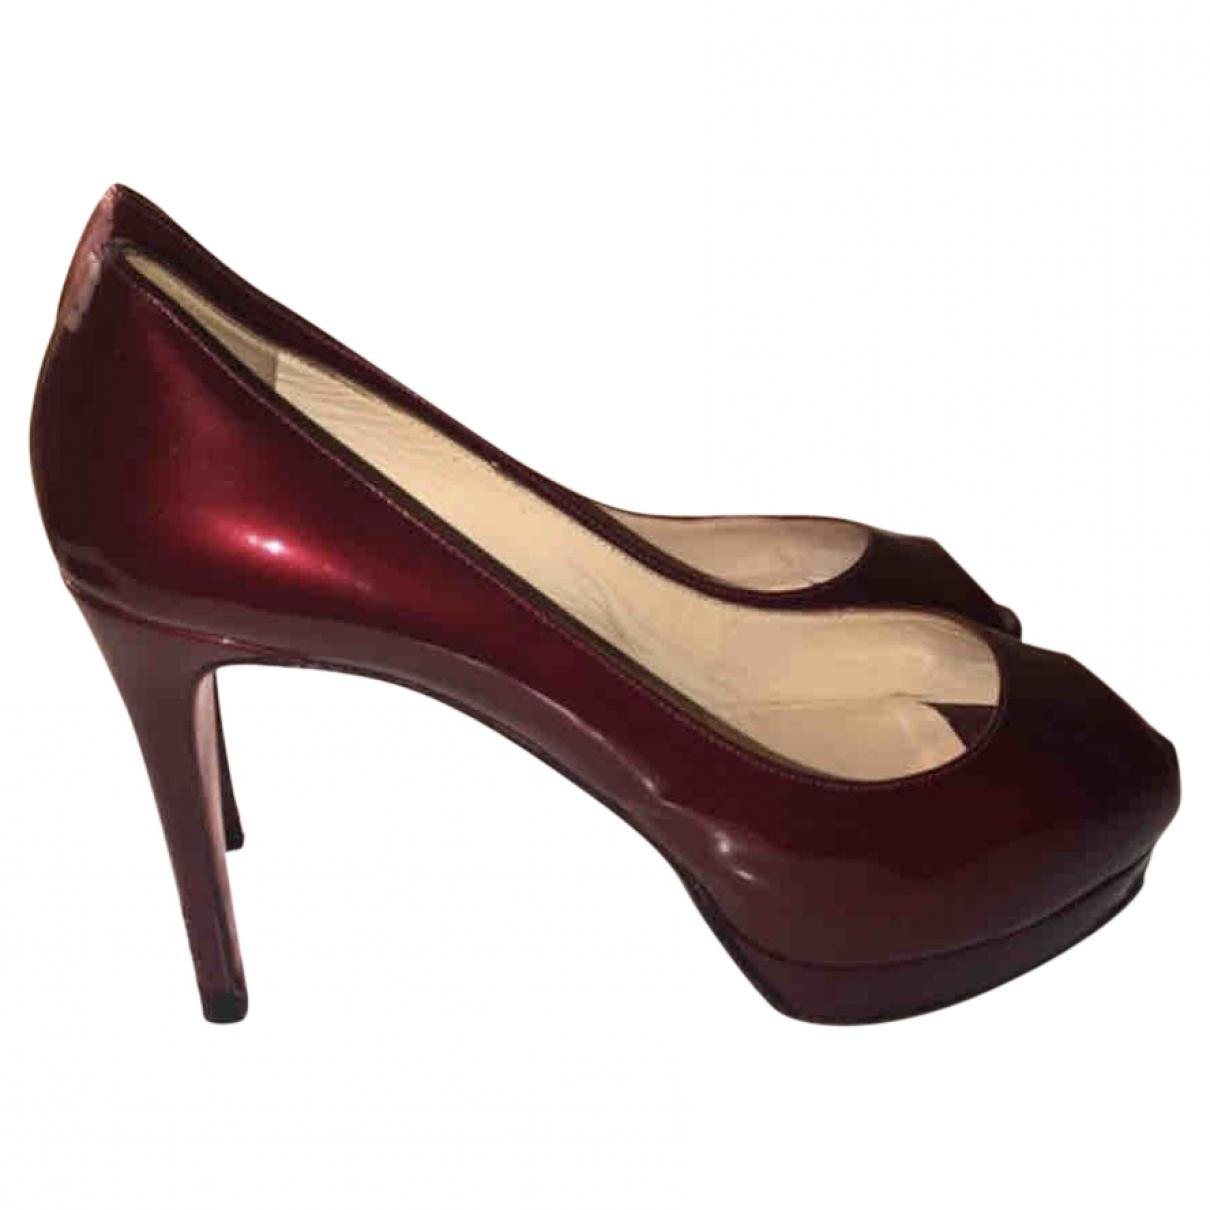 Christian Louboutin \N Burgundy Patent leather Heels for Women 39 EU